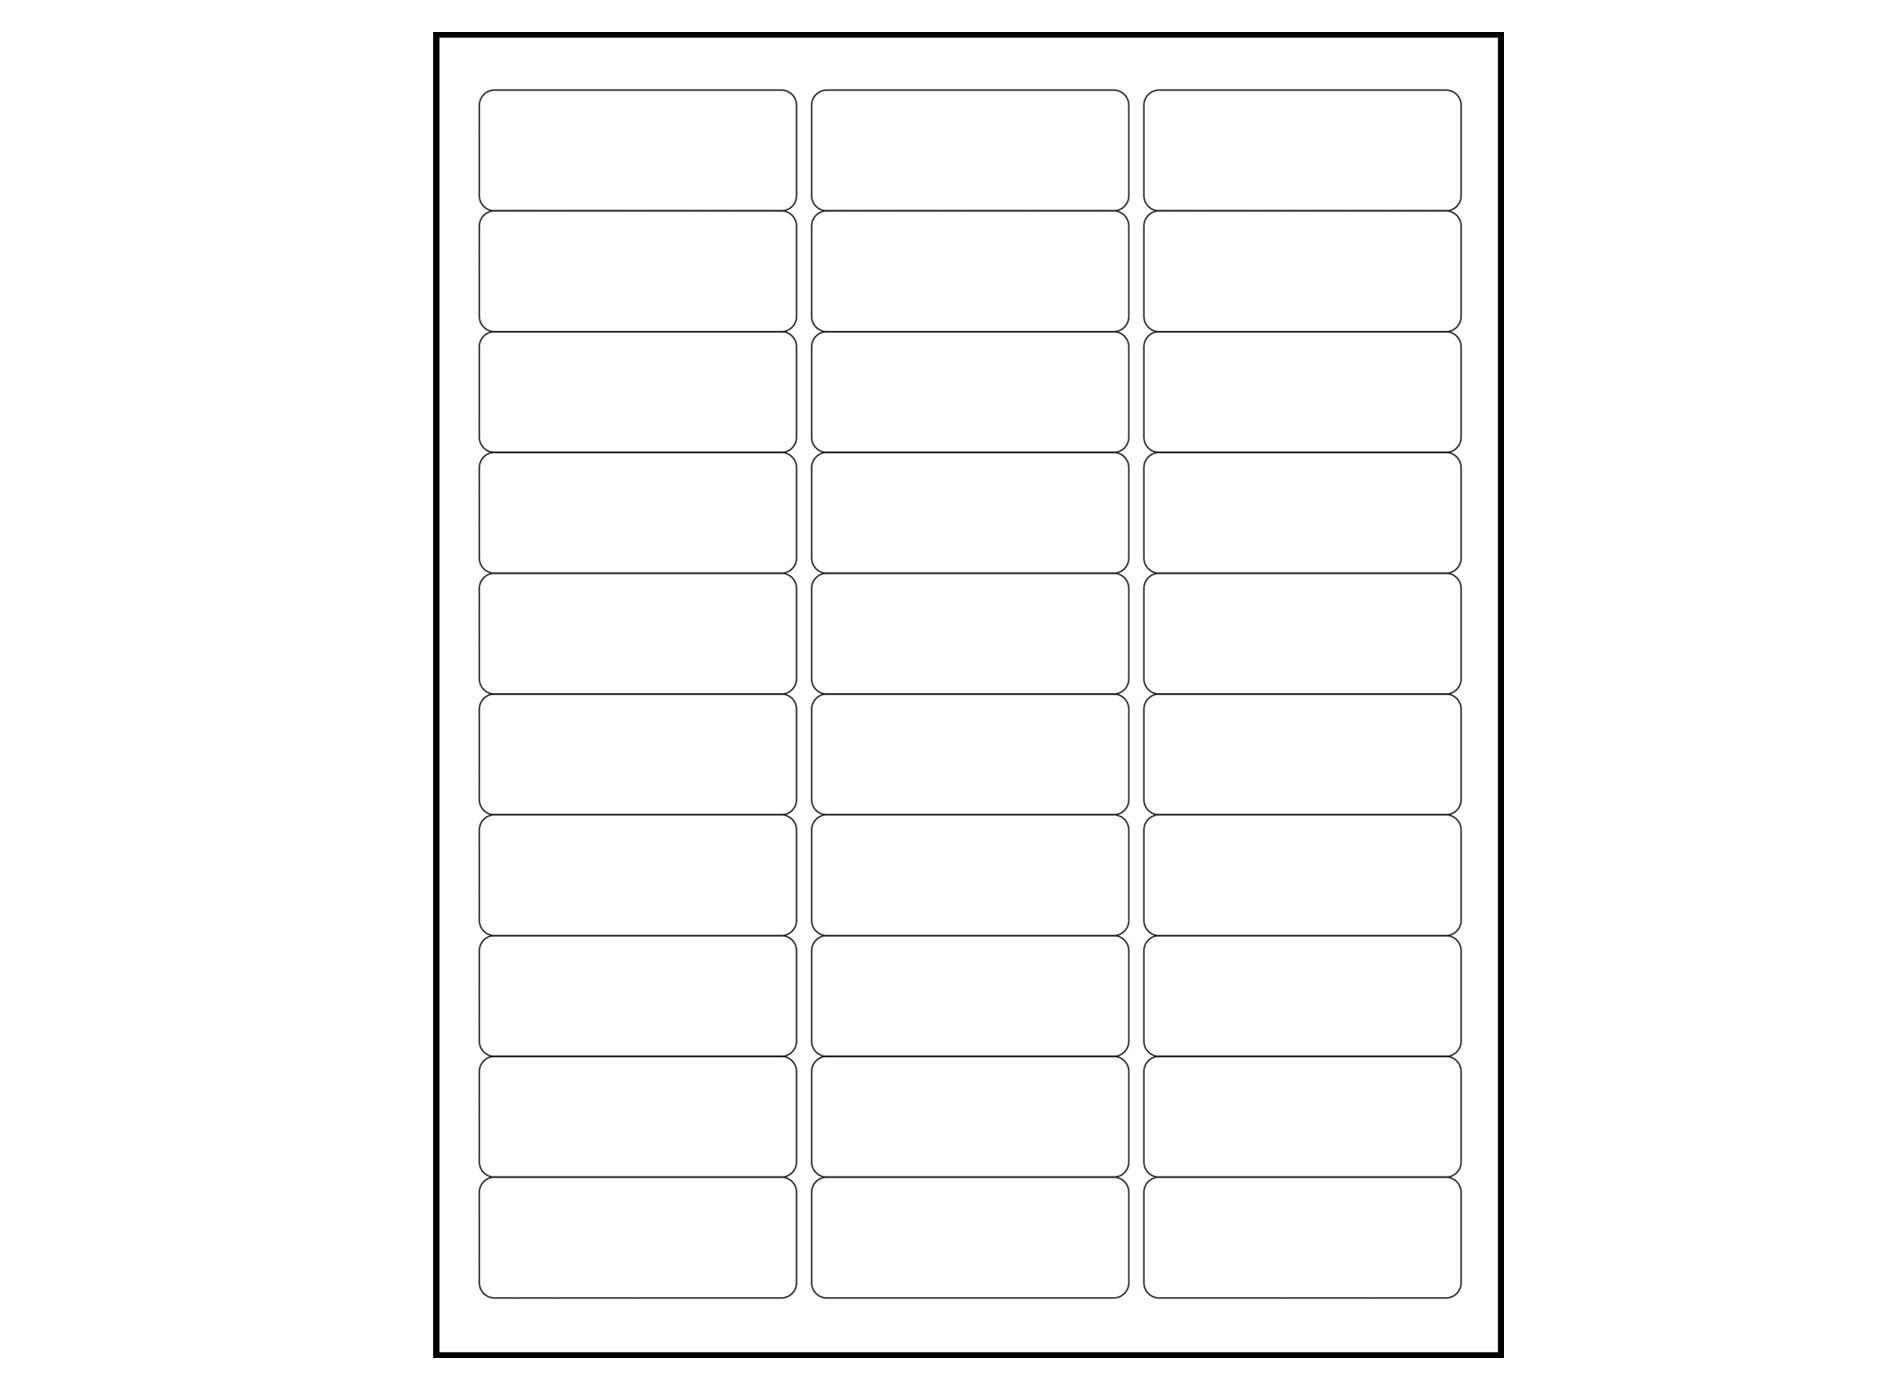 Blank  X    Address Labels Downloadable Label Template Via Regarding 1 X 2 5 8 Label Template